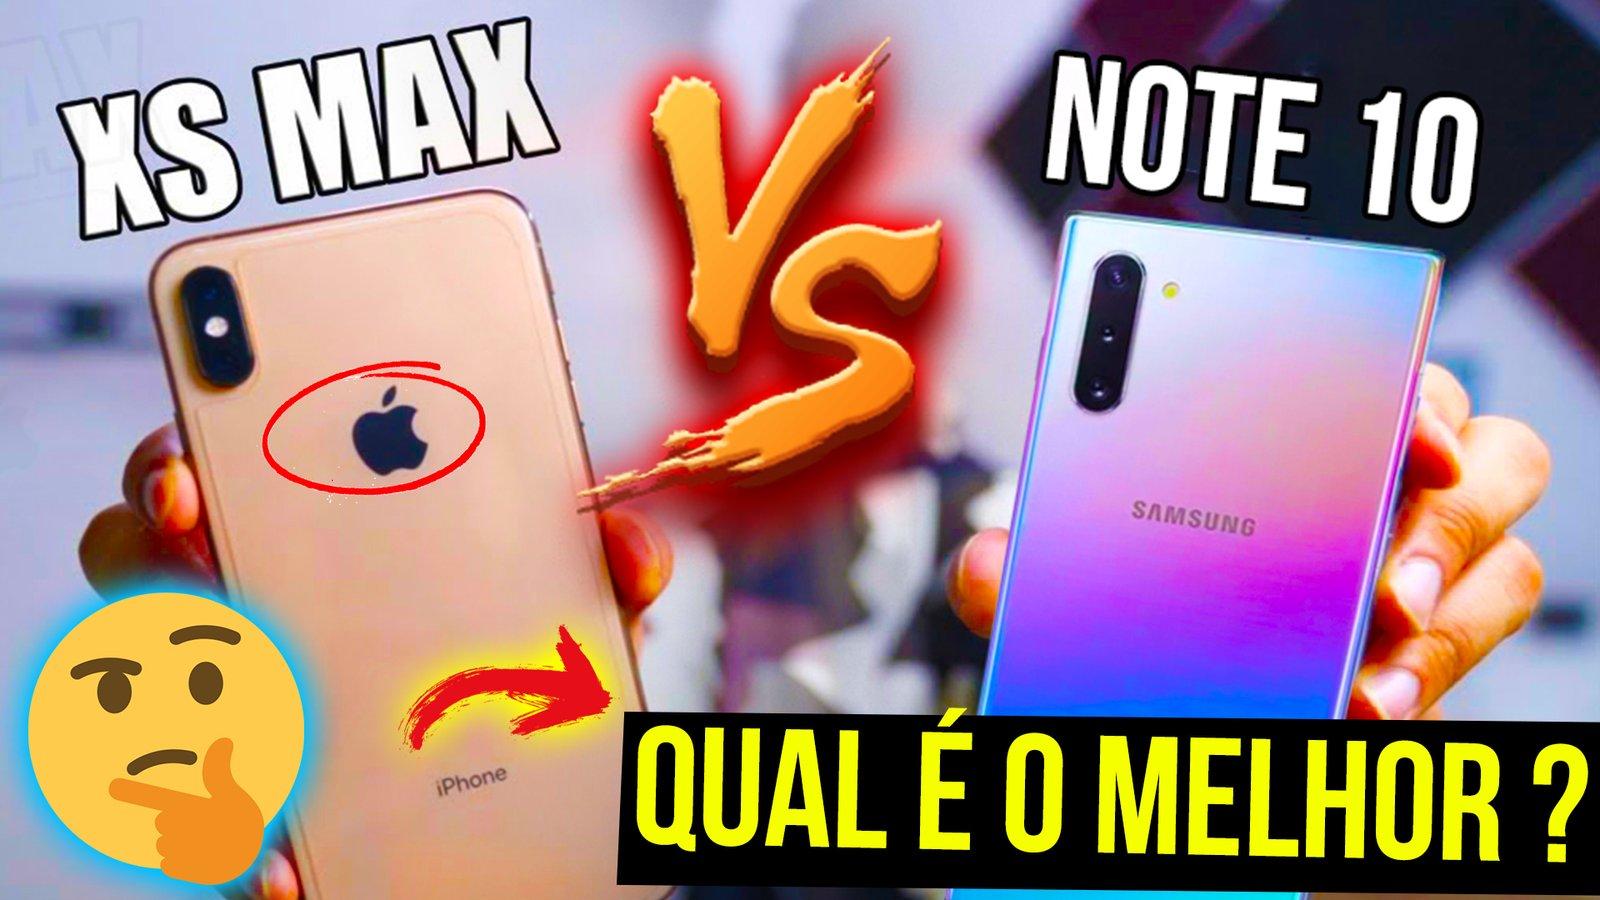 Galaxy NOTE 10 vs IPHONE XS MAX